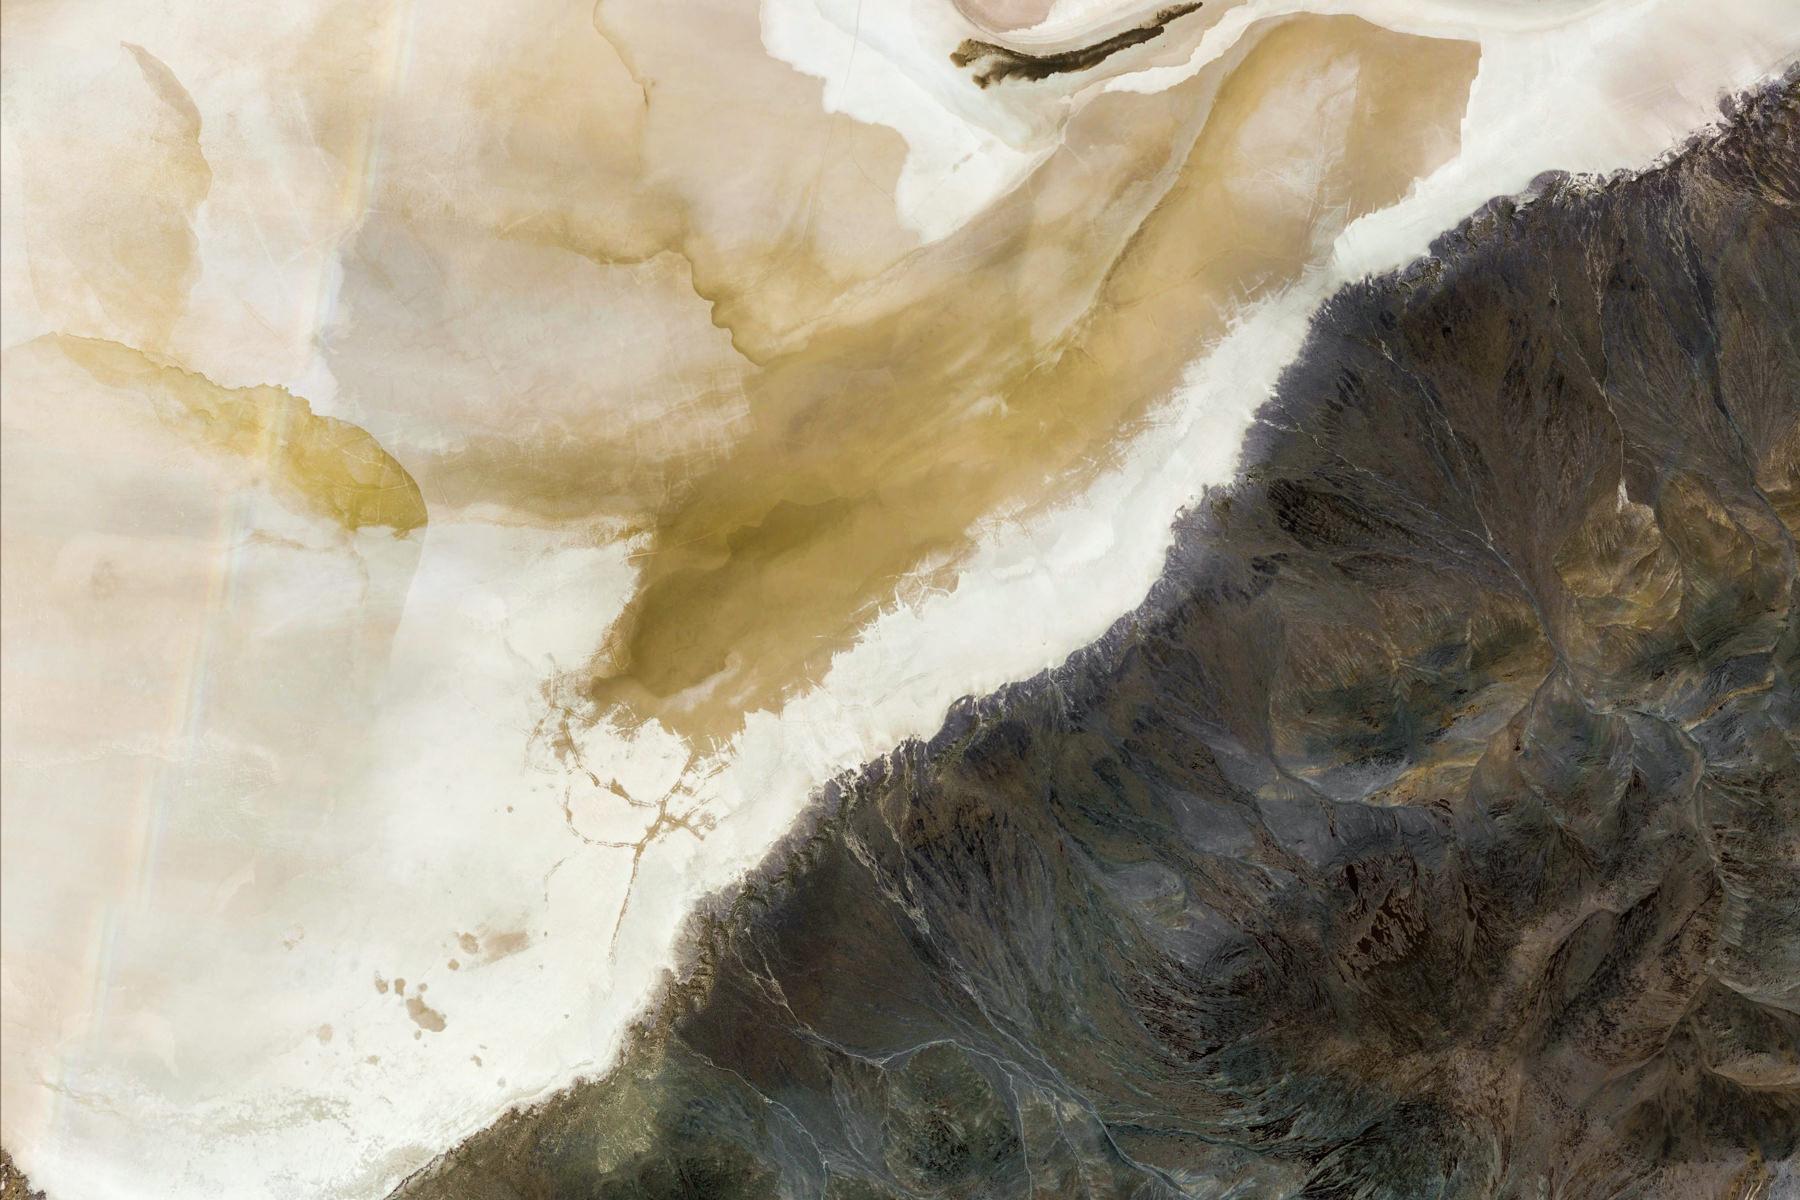 google-earth-US-PershingCounty-12502